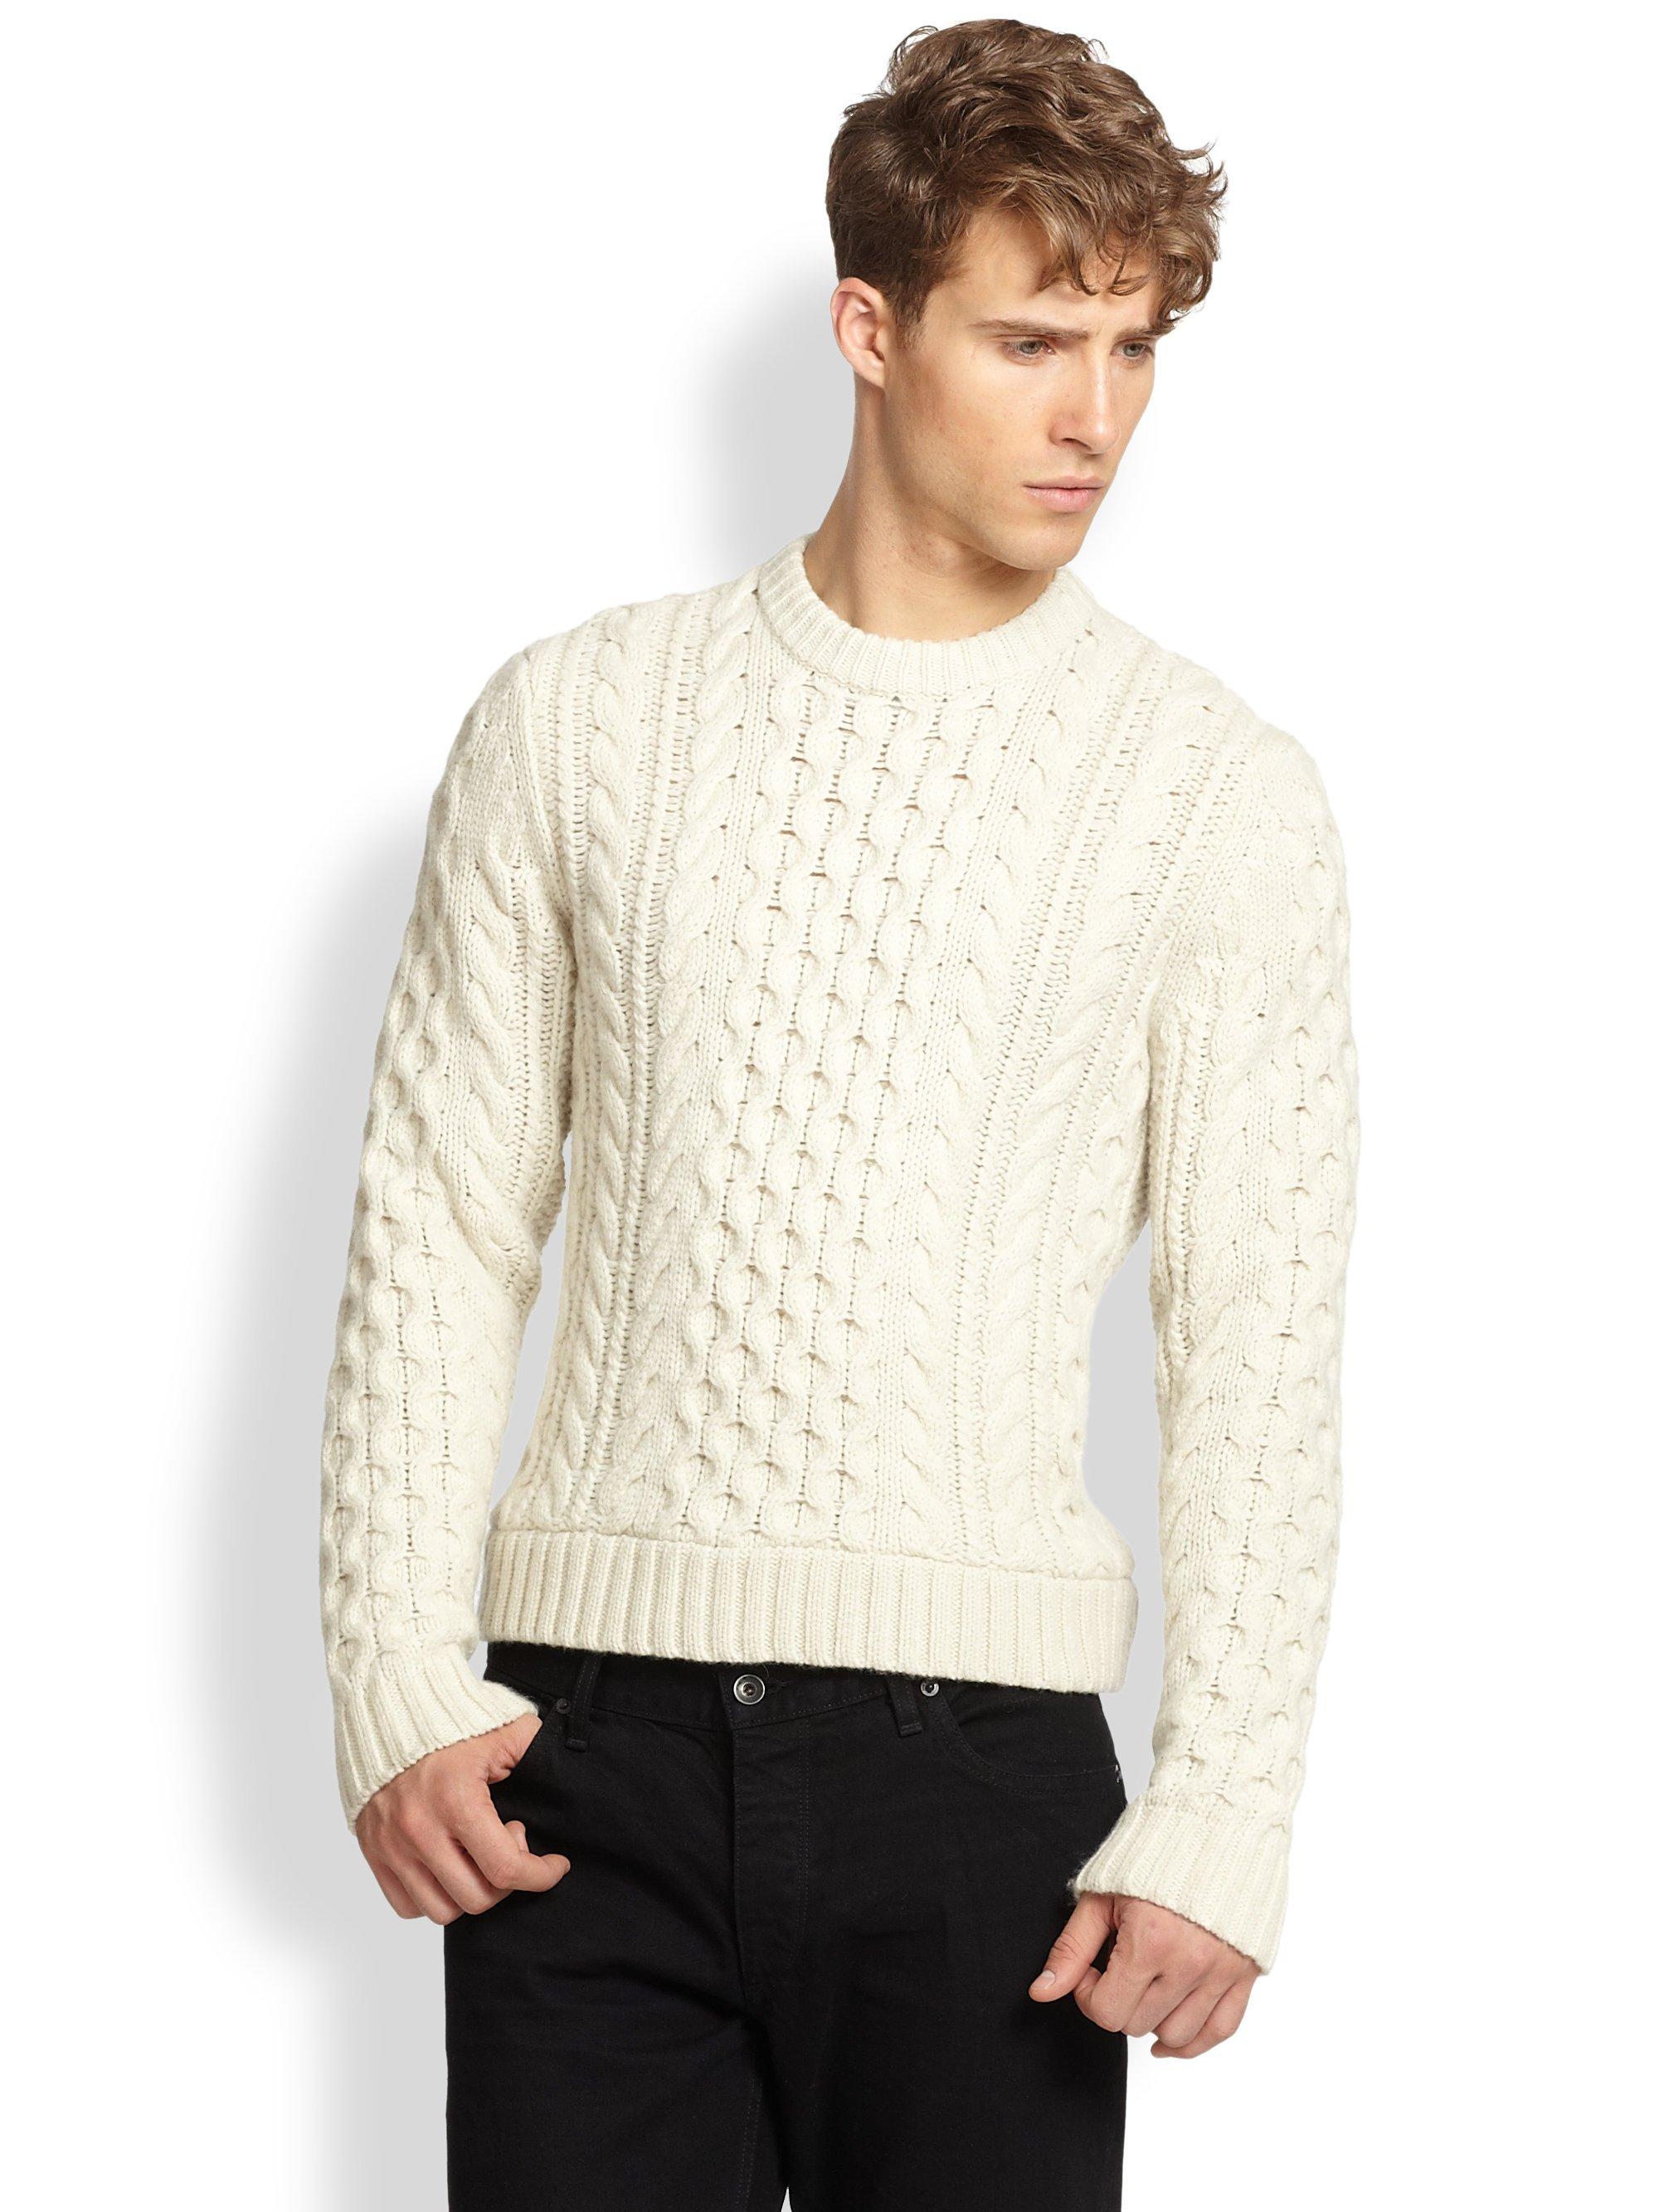 Rag & bone Trevor Cable Knit Wool Sweater in White for Men | Lyst